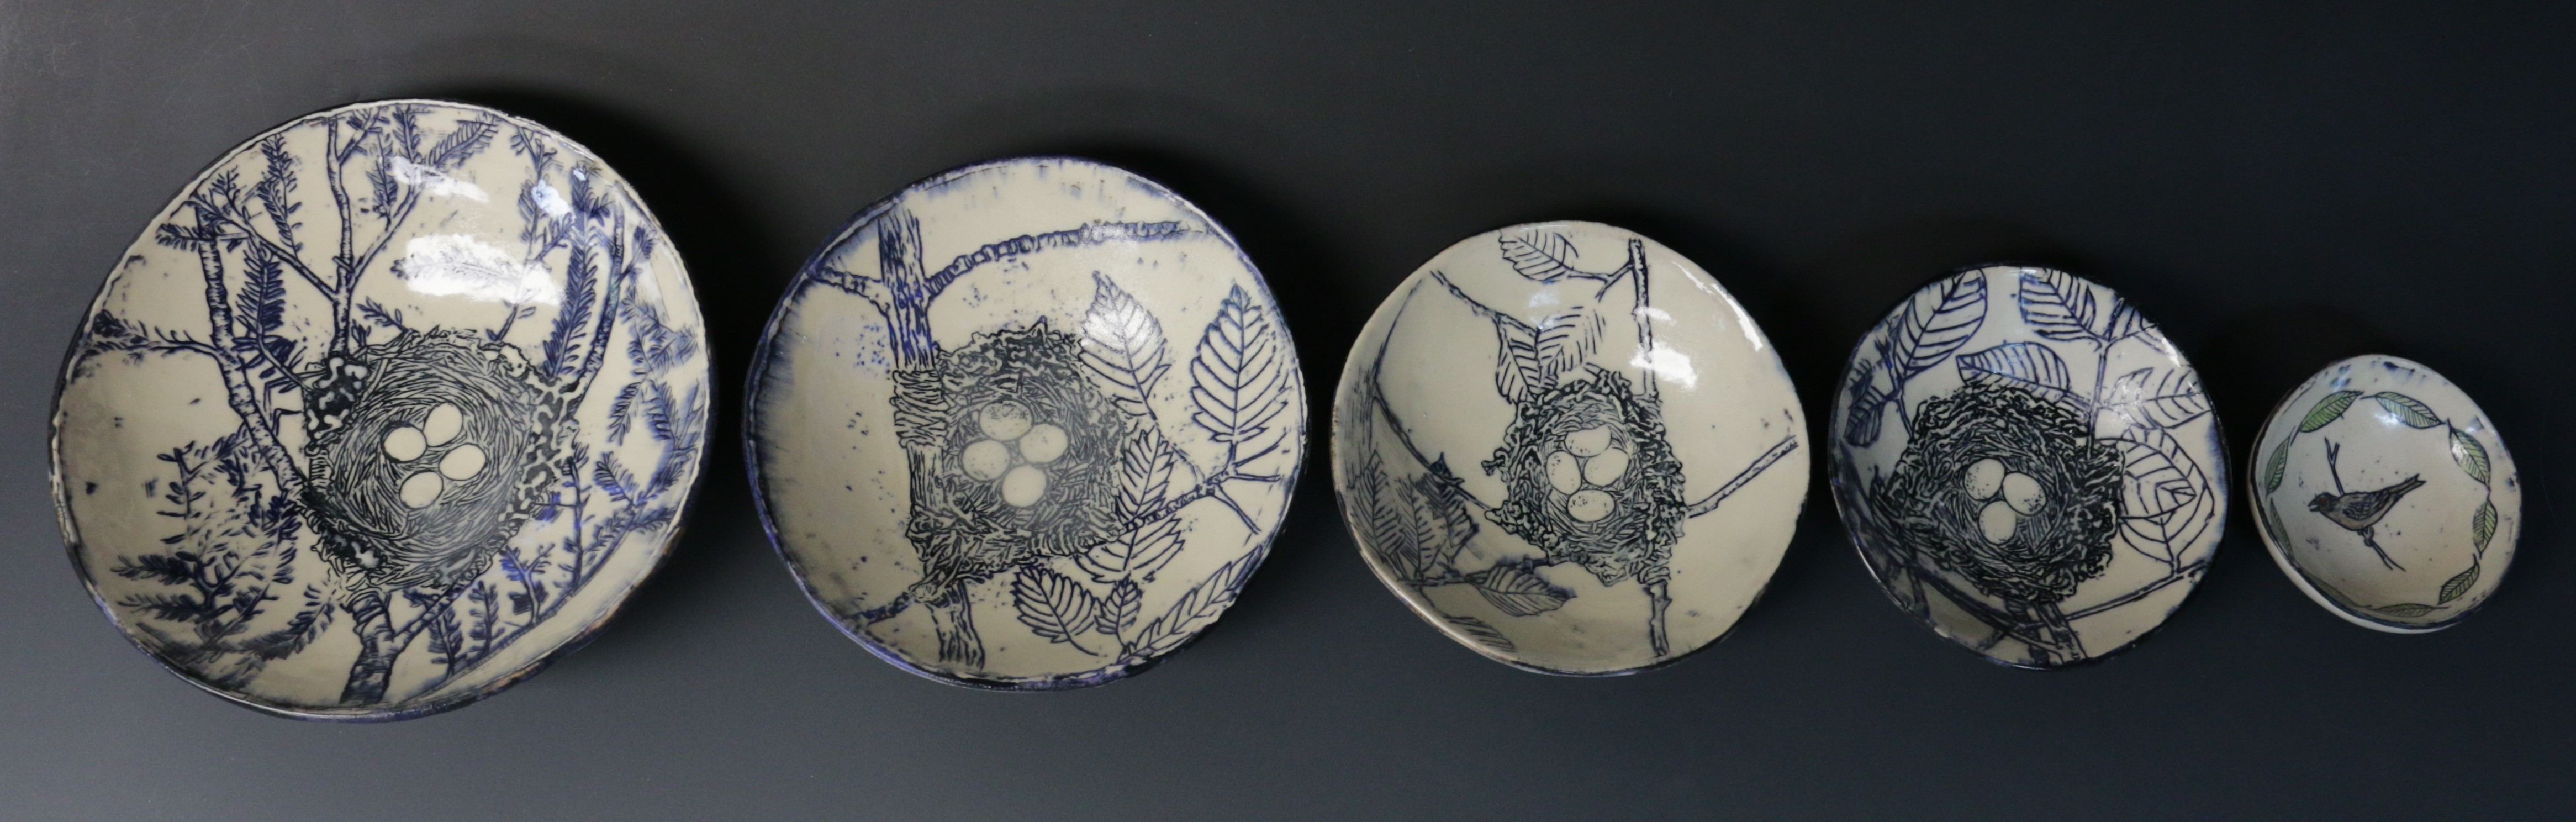 vireo decending bowls small 4